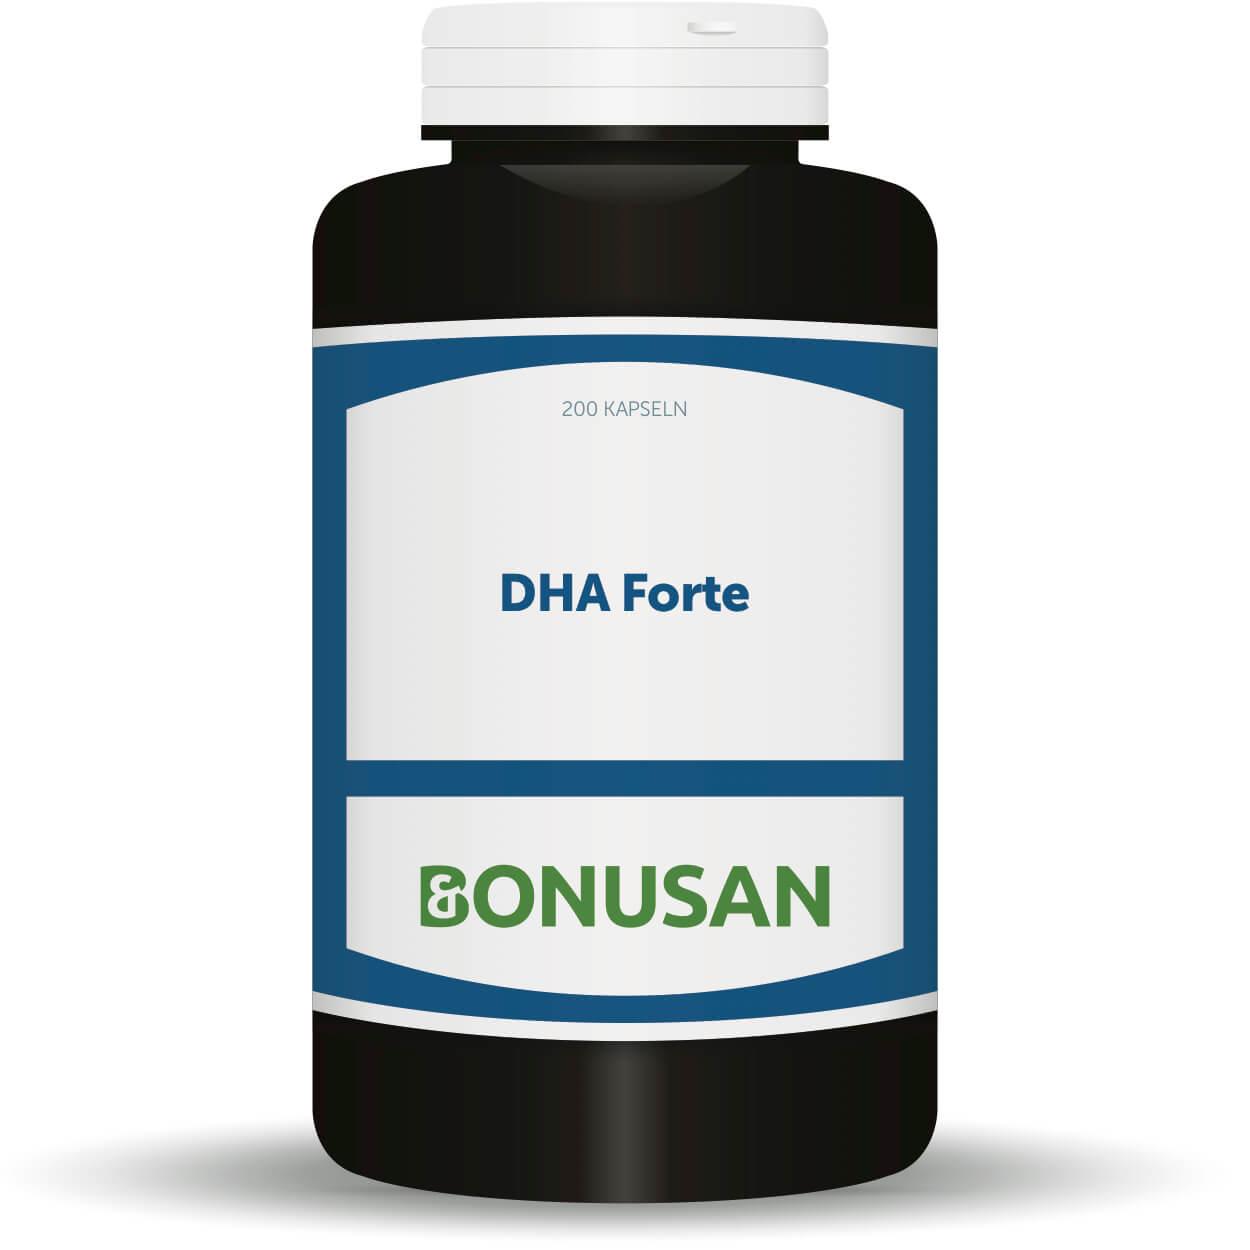 DHA Forte Omega 3 Großpackung